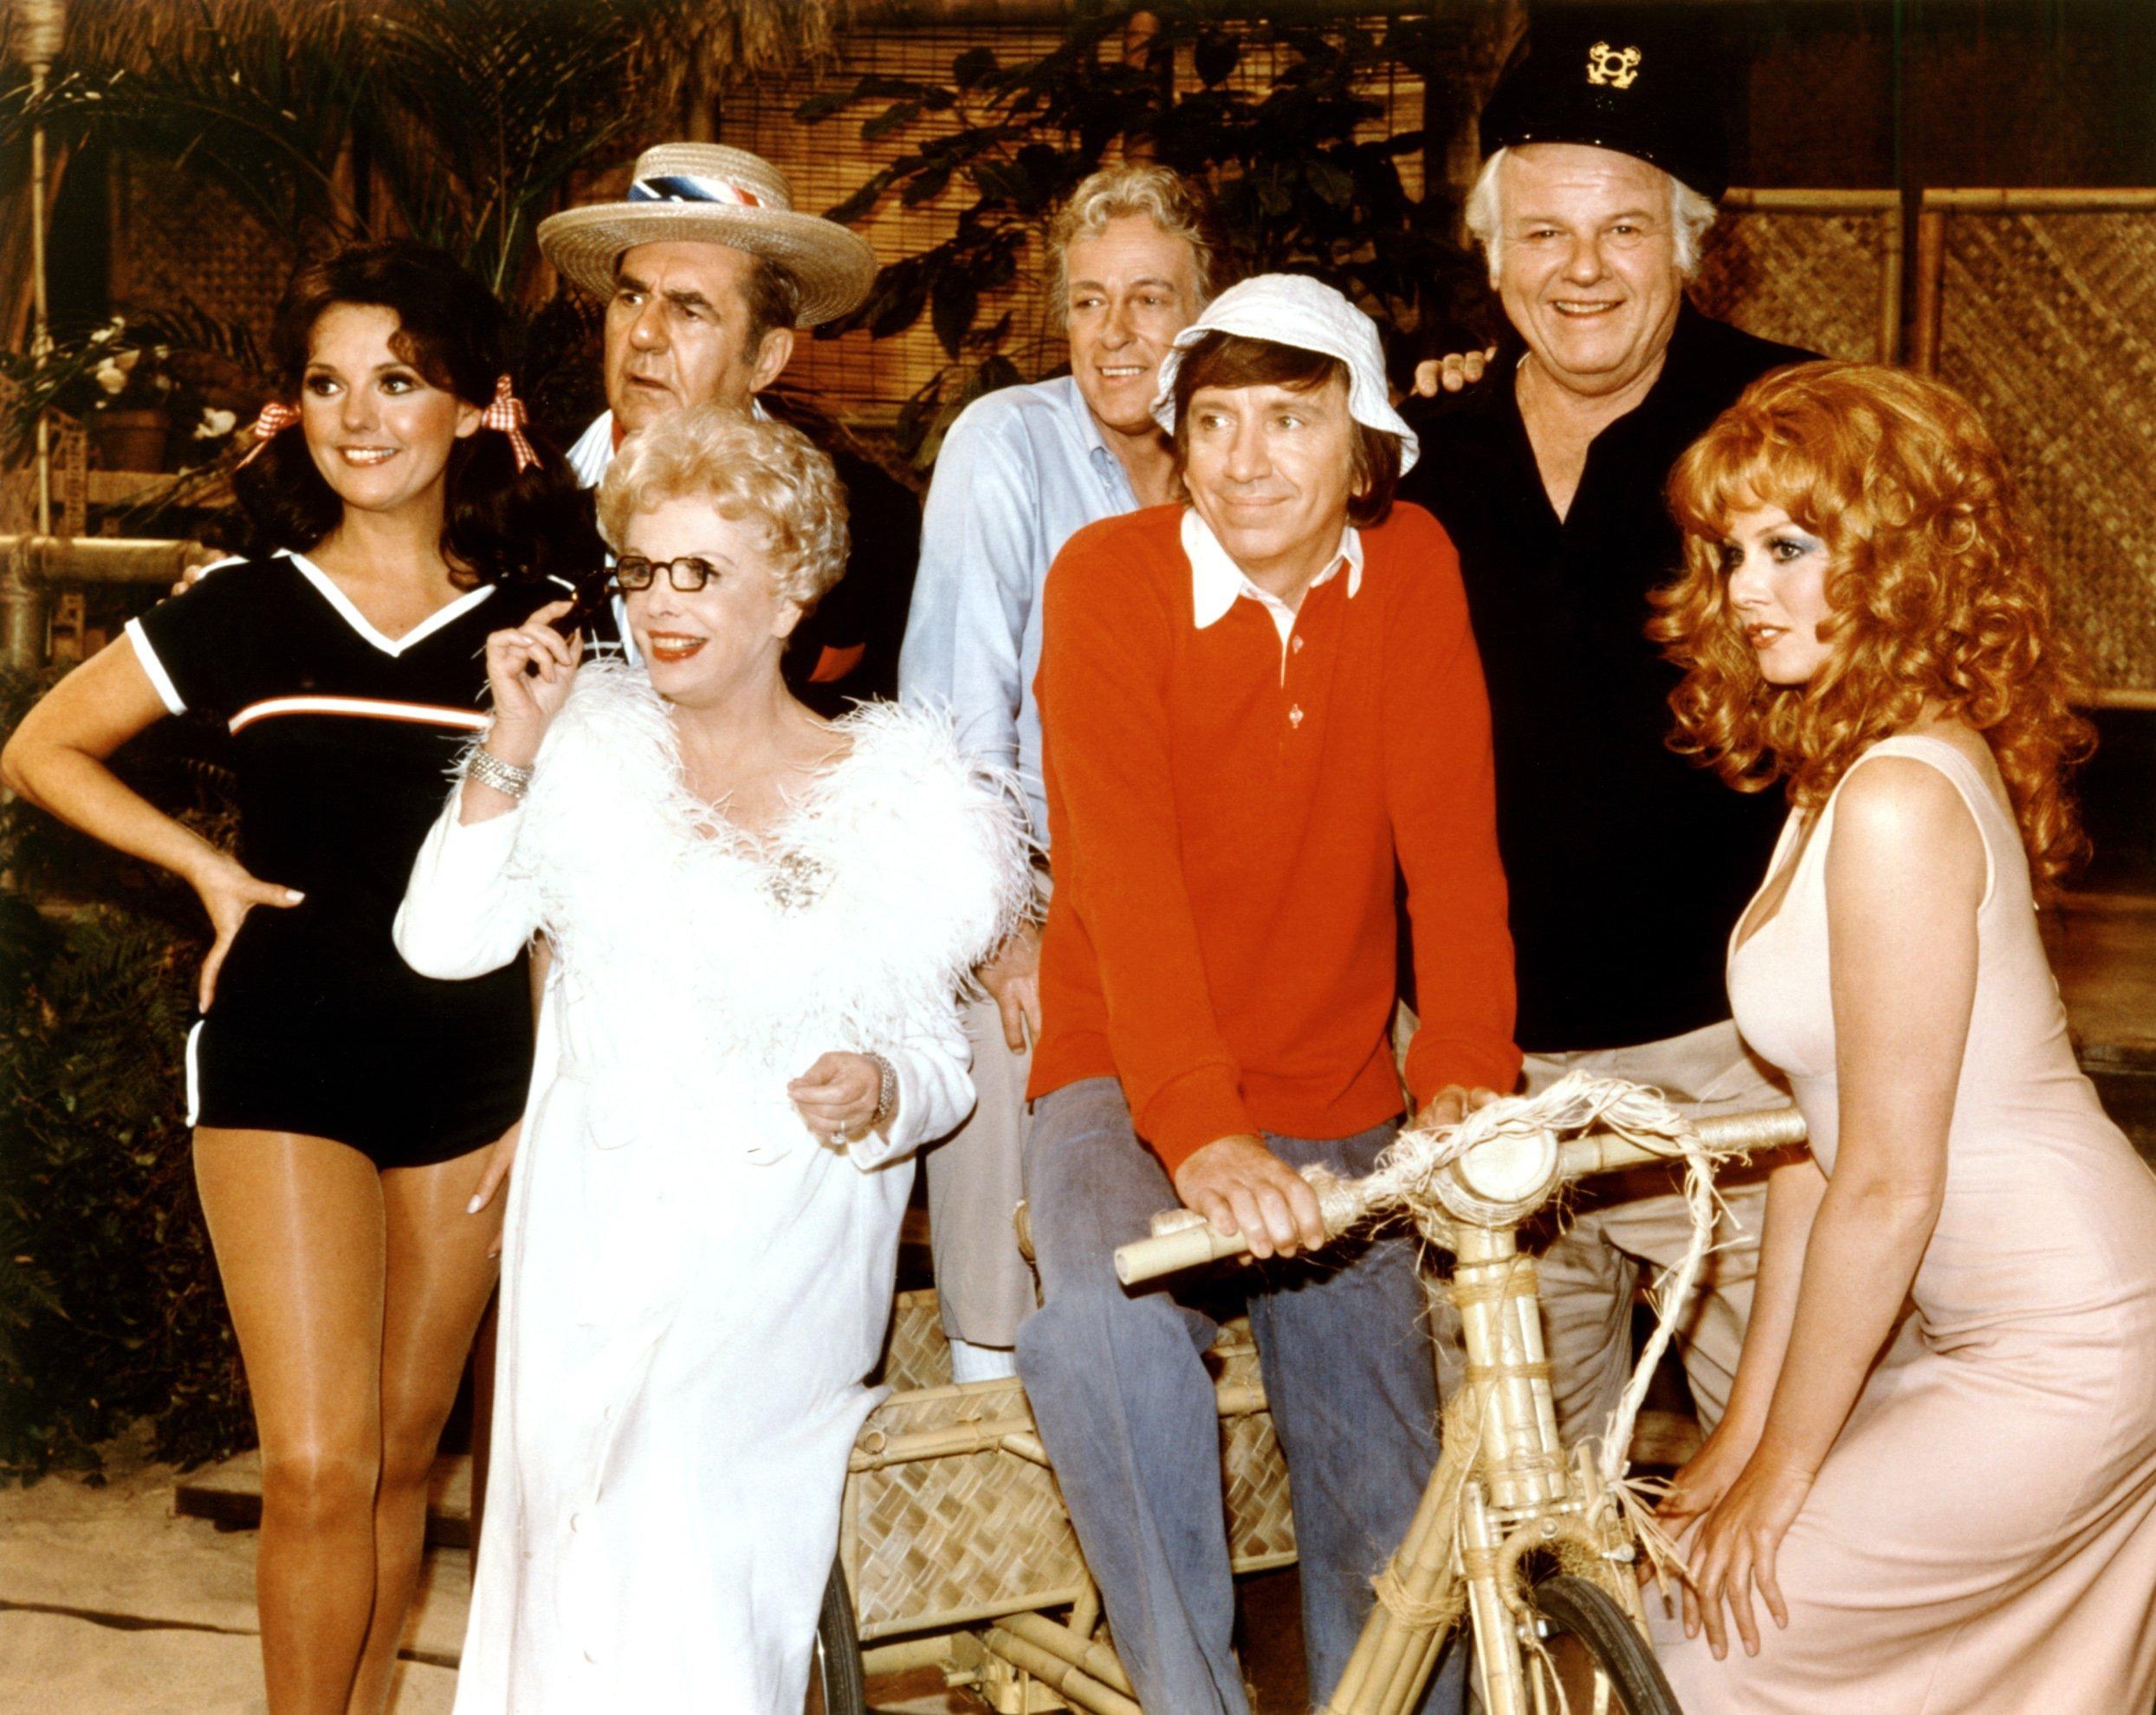 gilligan's island cast members